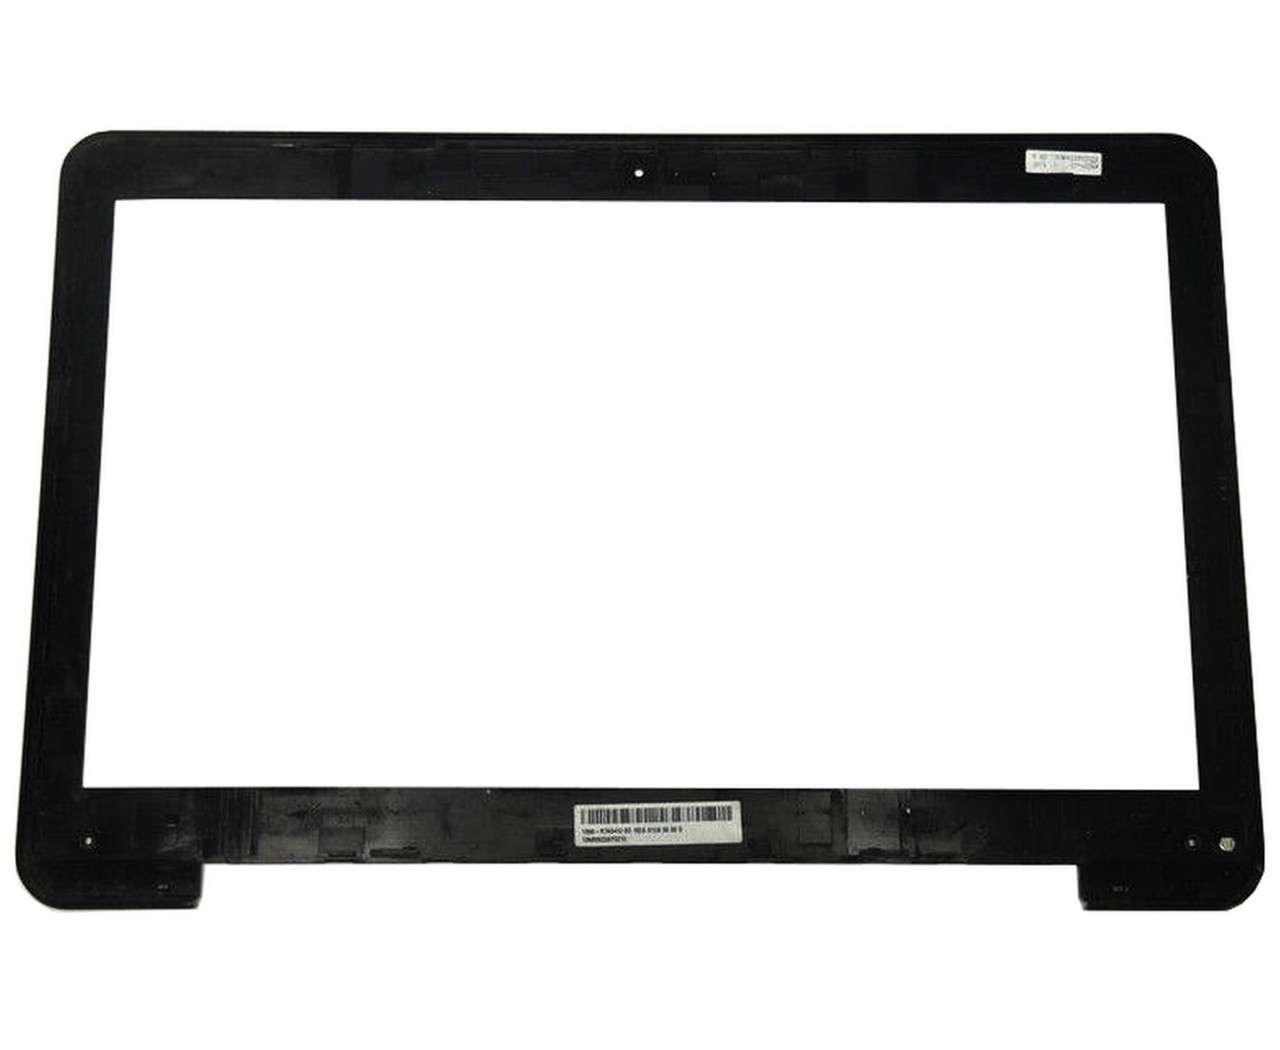 Rama Display Asus A555LB Bezel Front Cover Neagra imagine powerlaptop.ro 2021